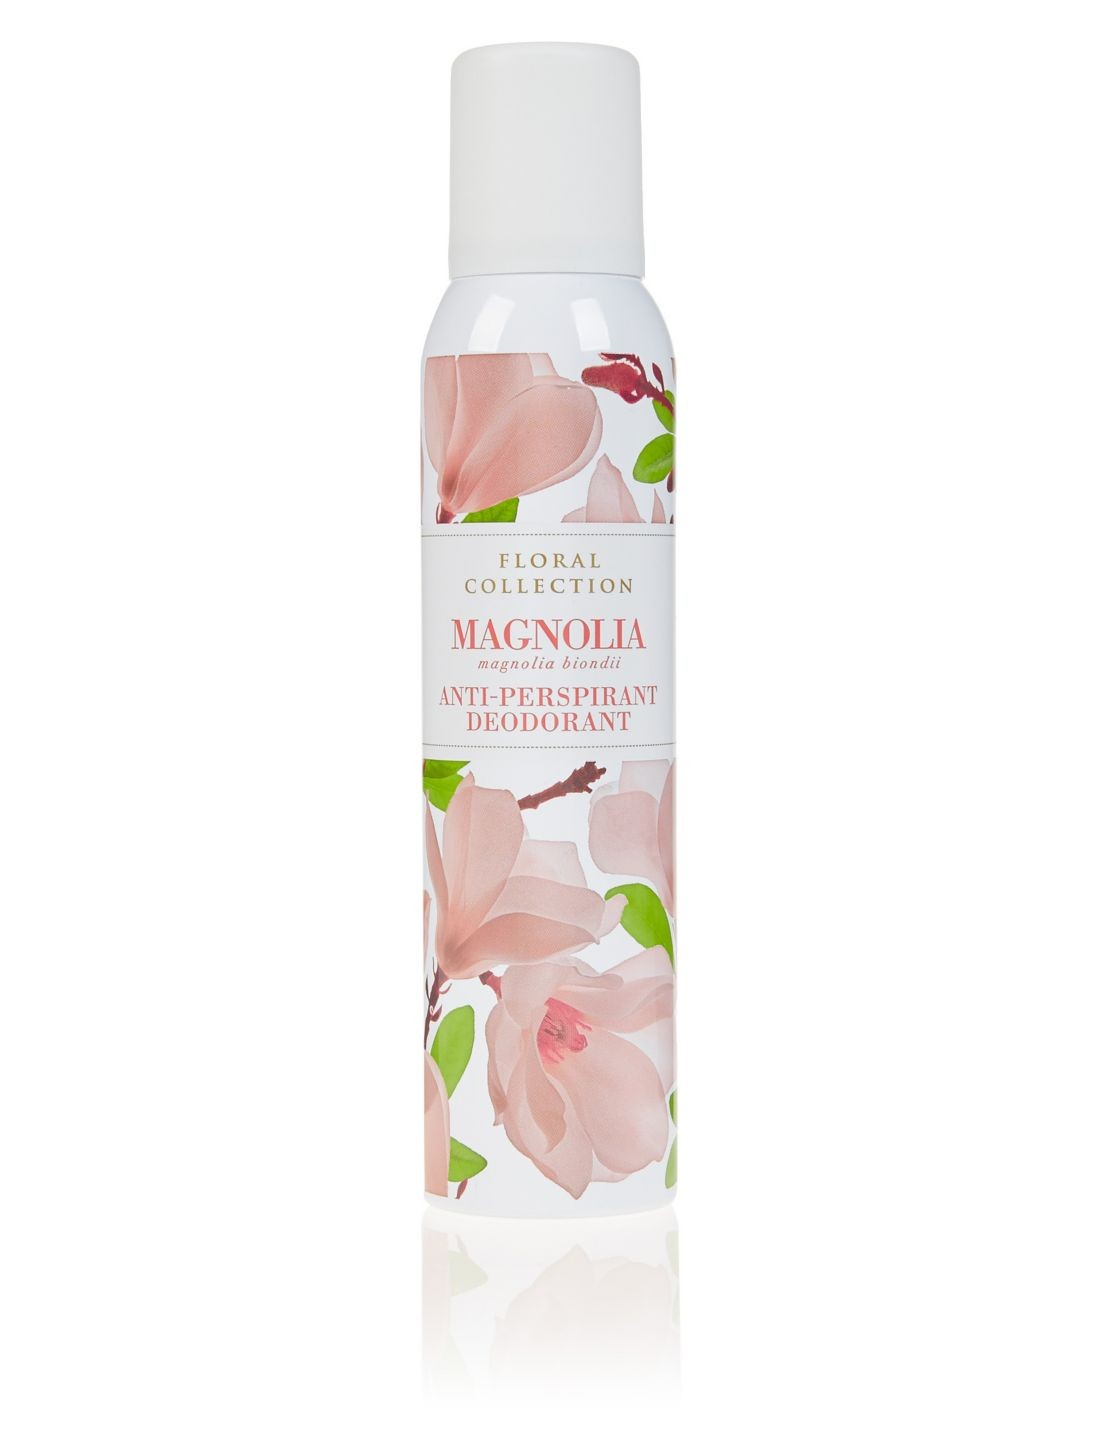 Manolya Kokulu Anti-Perspirant Deodorant 150ml